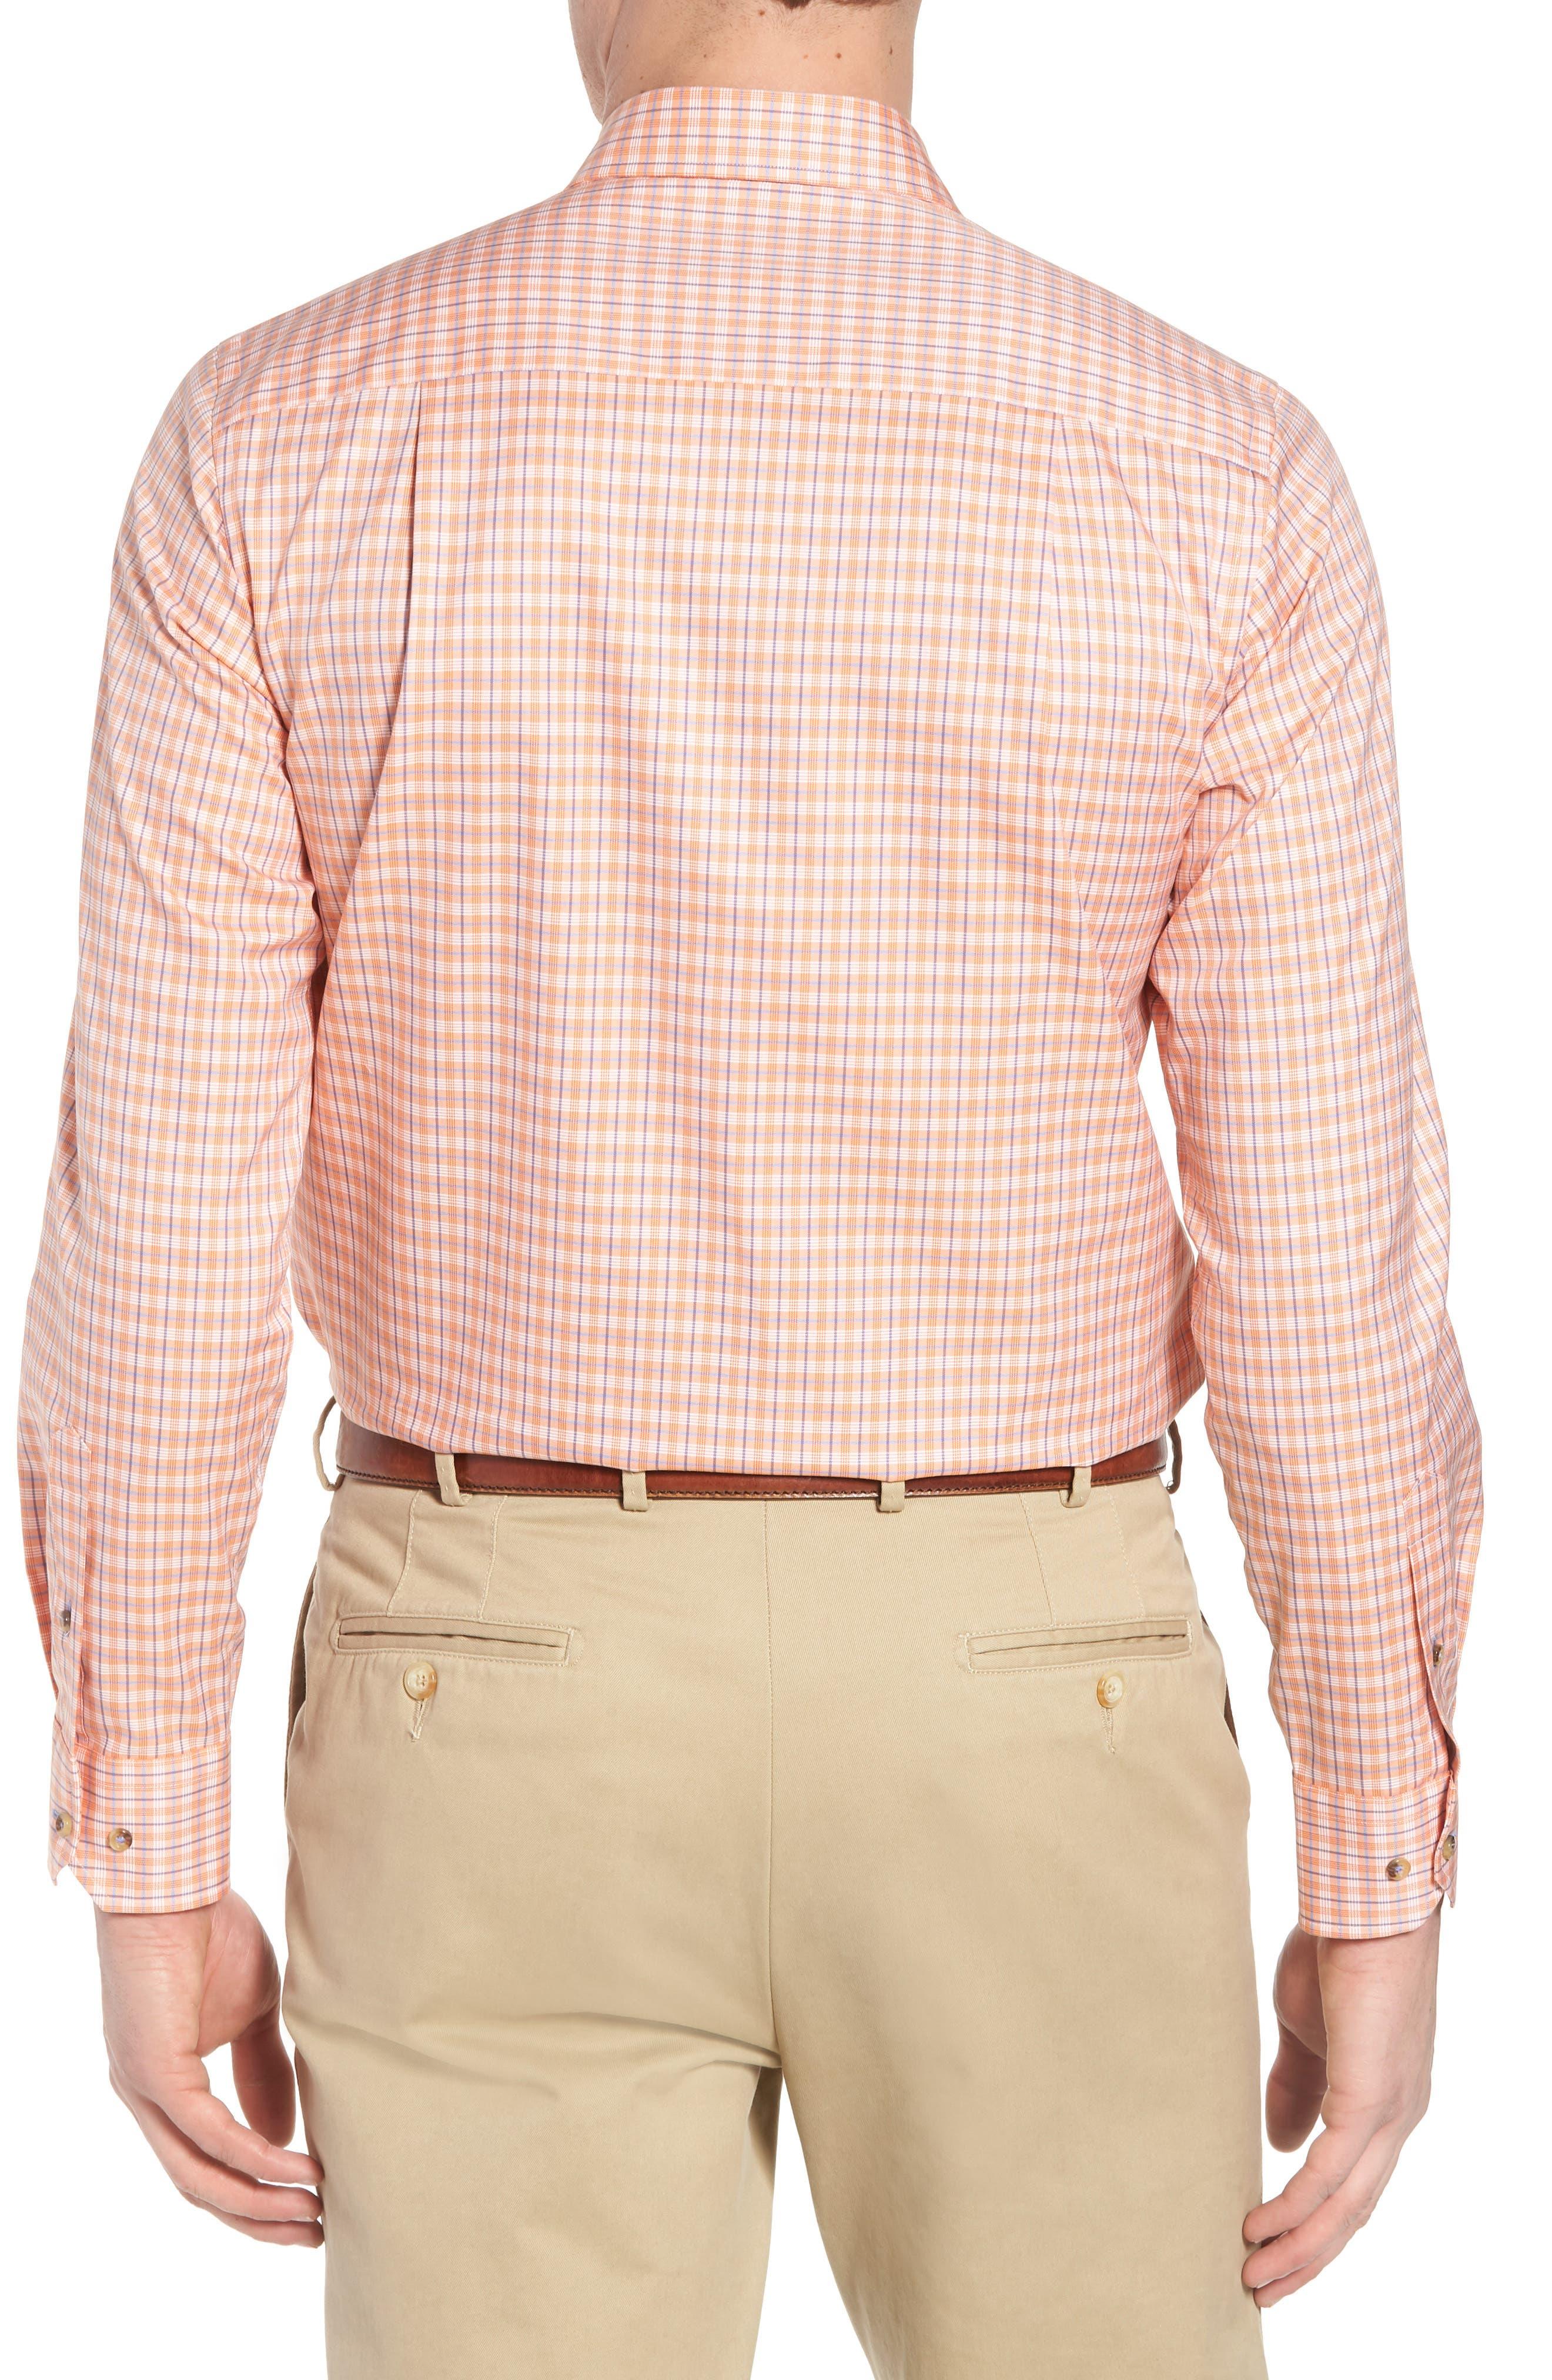 Regular Fit Plaid Sport Shirt,                             Alternate thumbnail 2, color,                             Melon